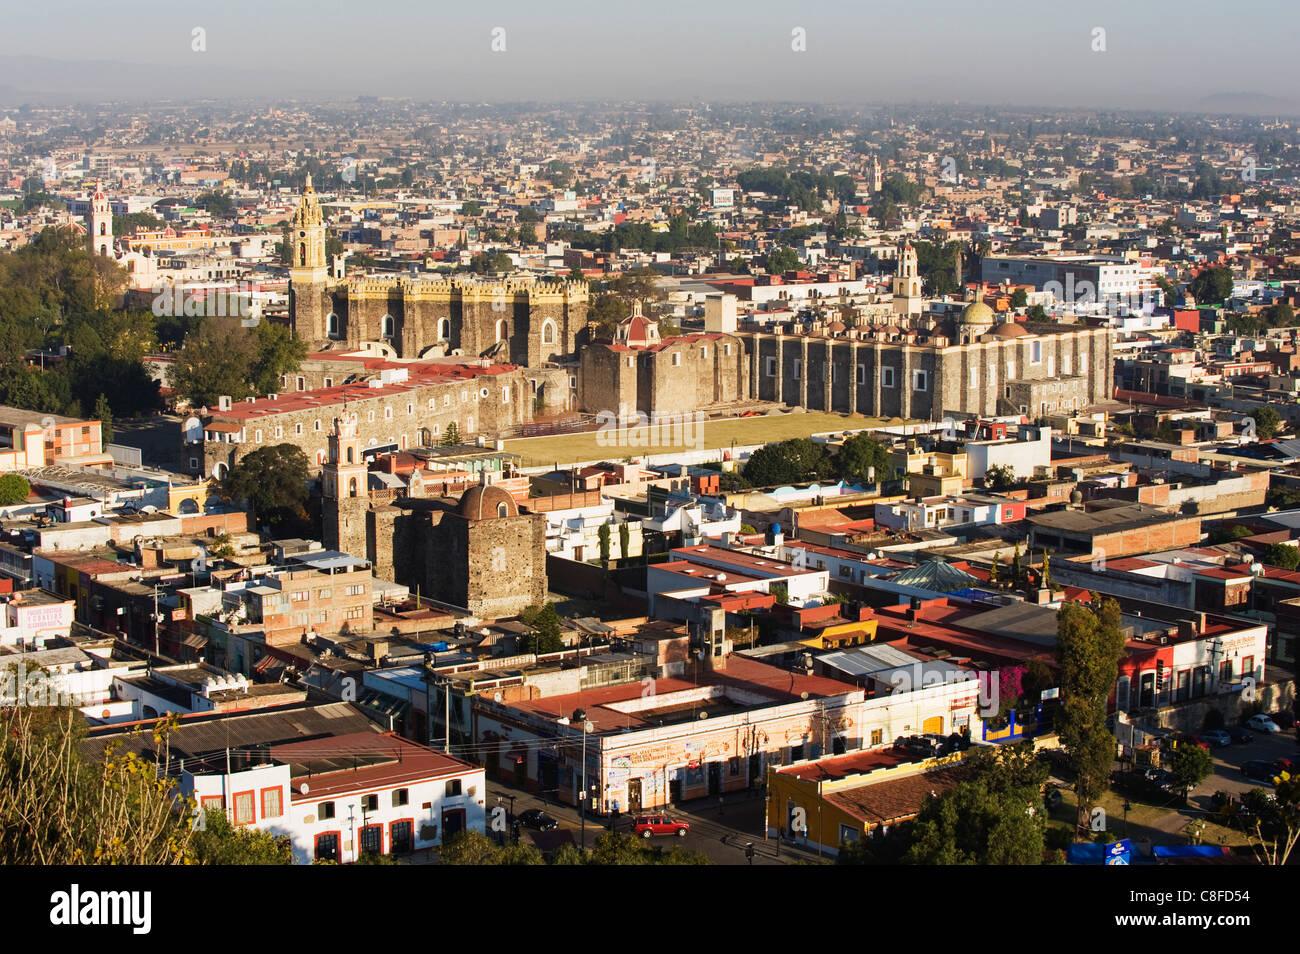 Cholula, Puebla state, Mexico North America - Stock Image